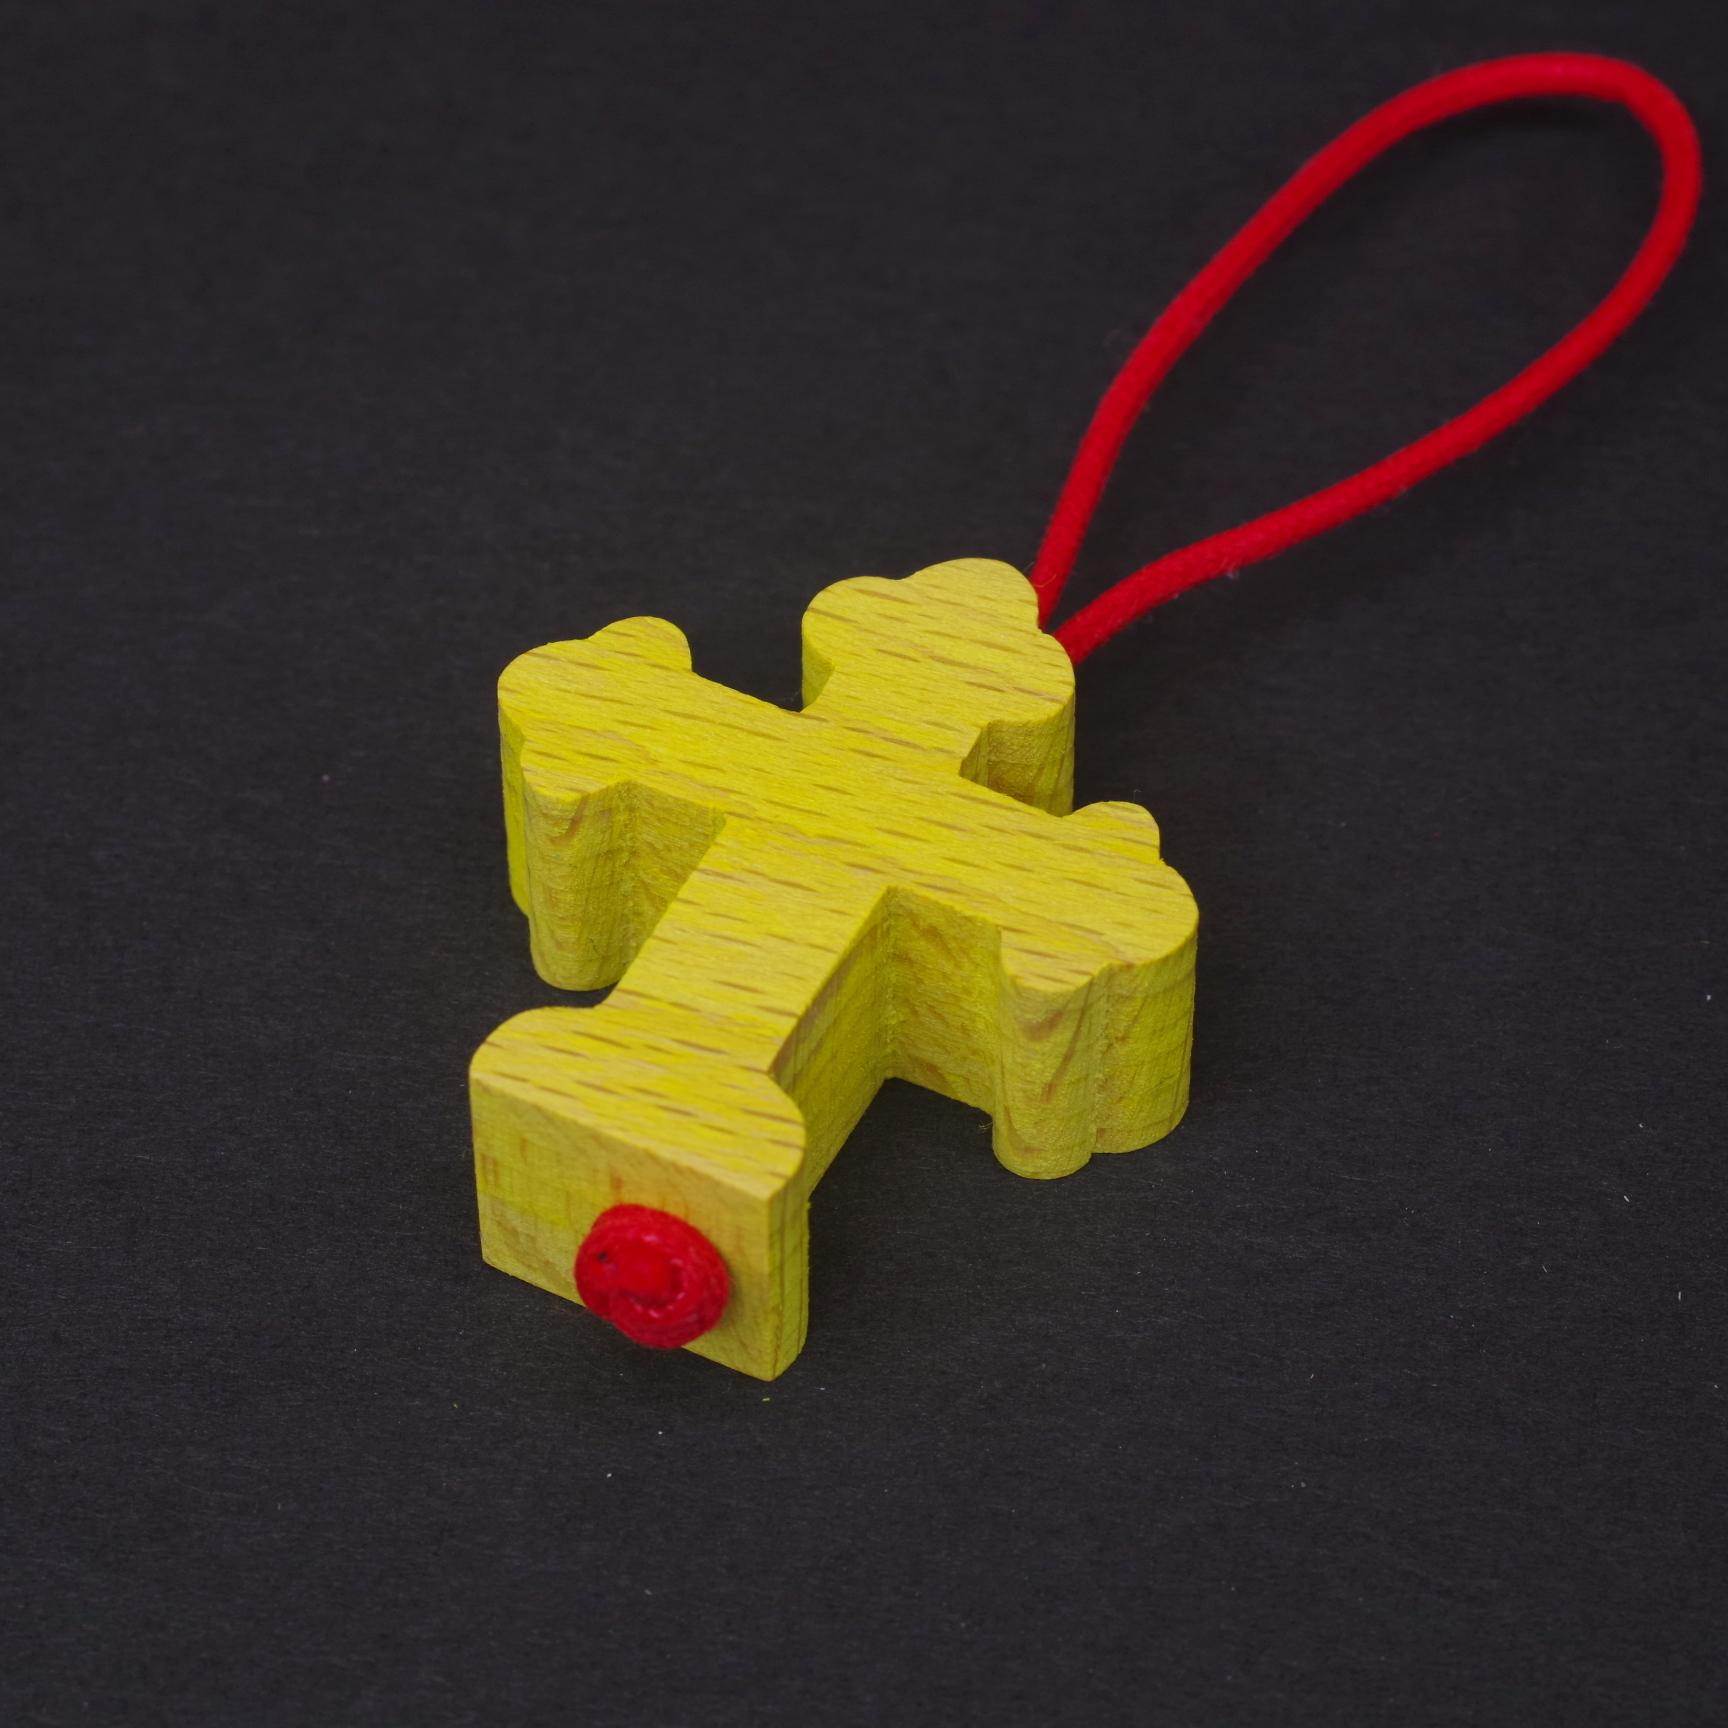 小黒三郎 オーナメント 十字架